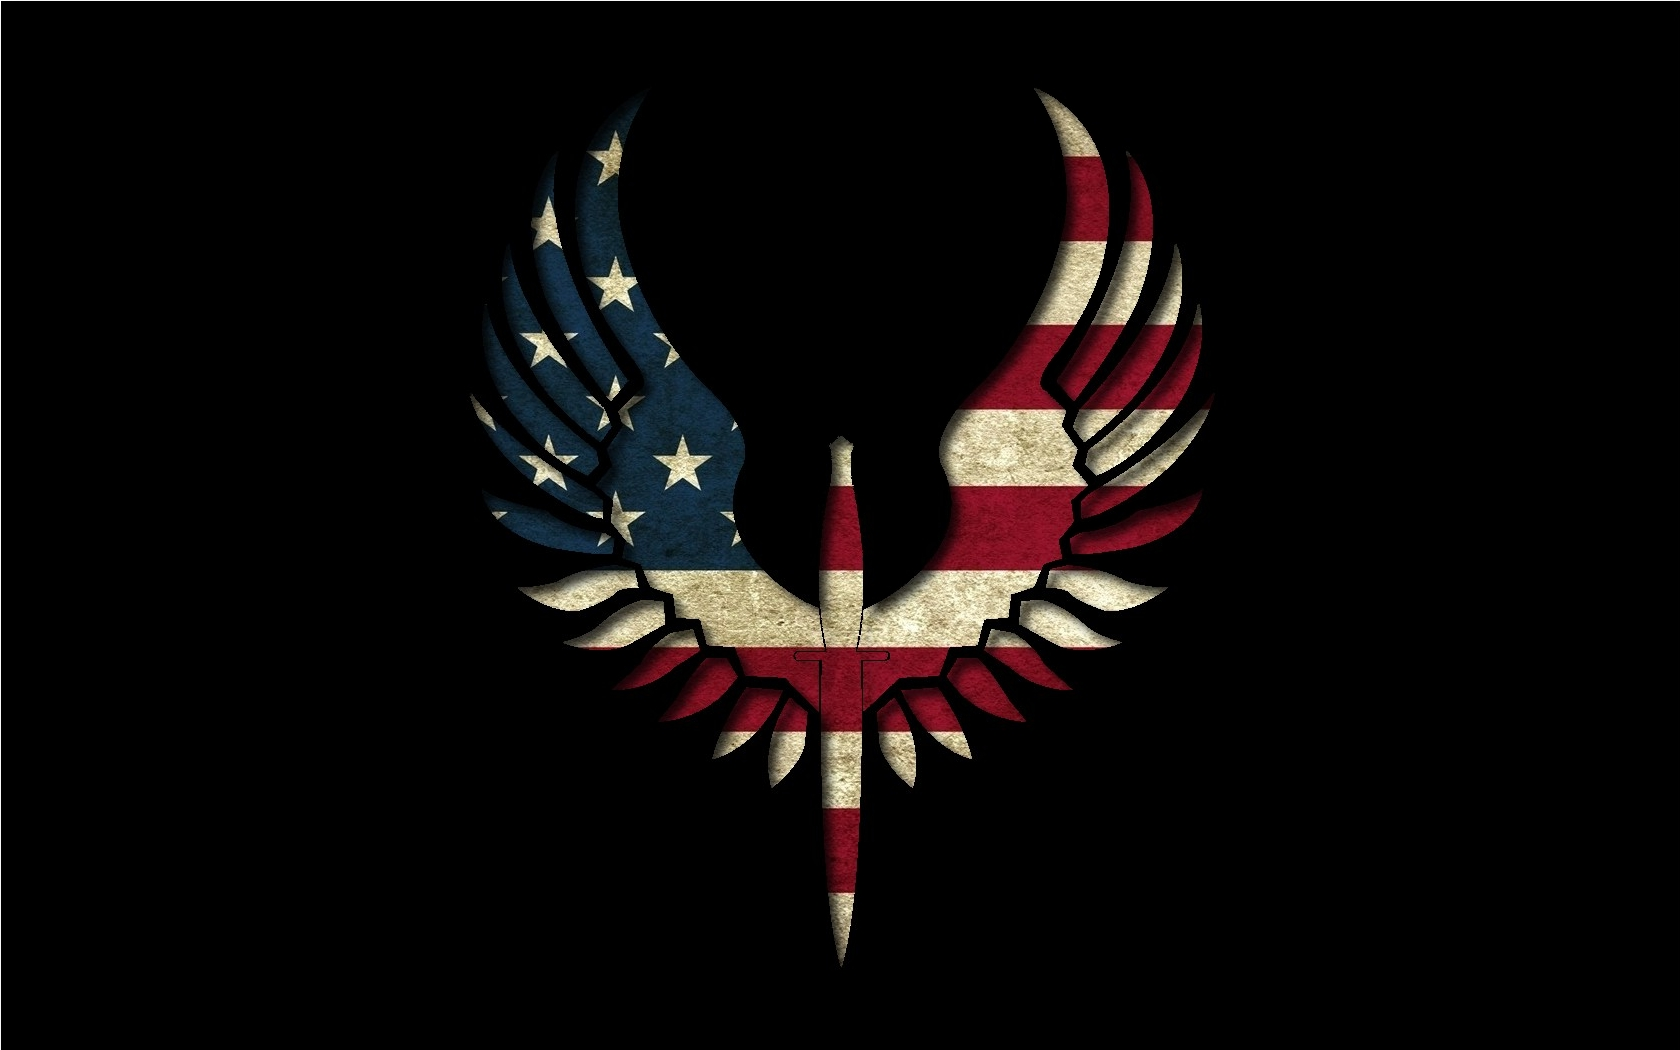 Eagles flags USA wallpaper 1680x1050 61873 WallpaperUP 1680x1050